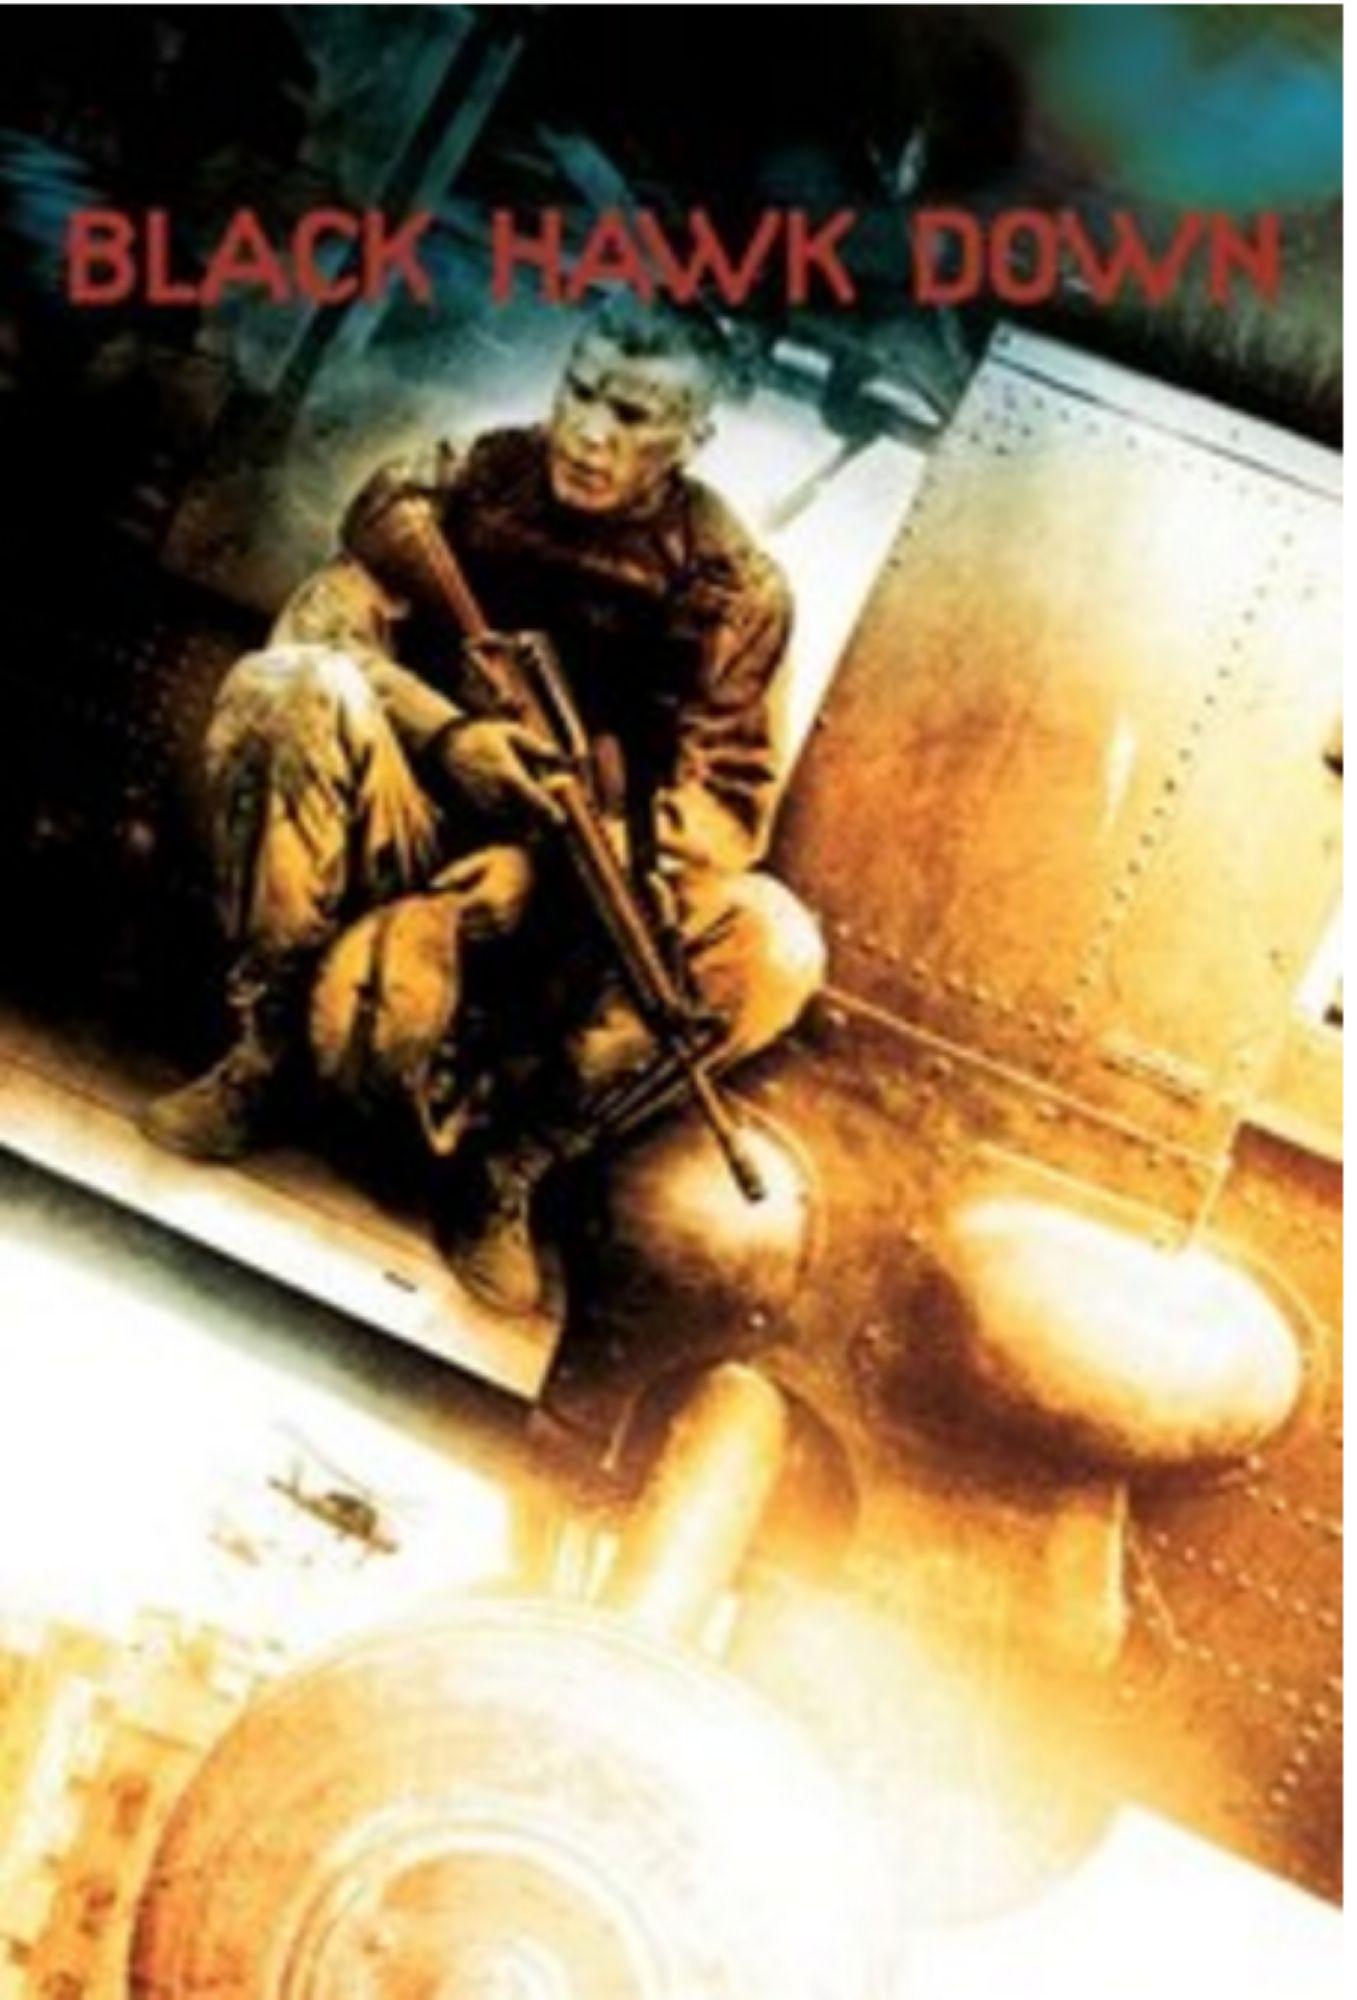 04-Black-Hawk-Down.jpg